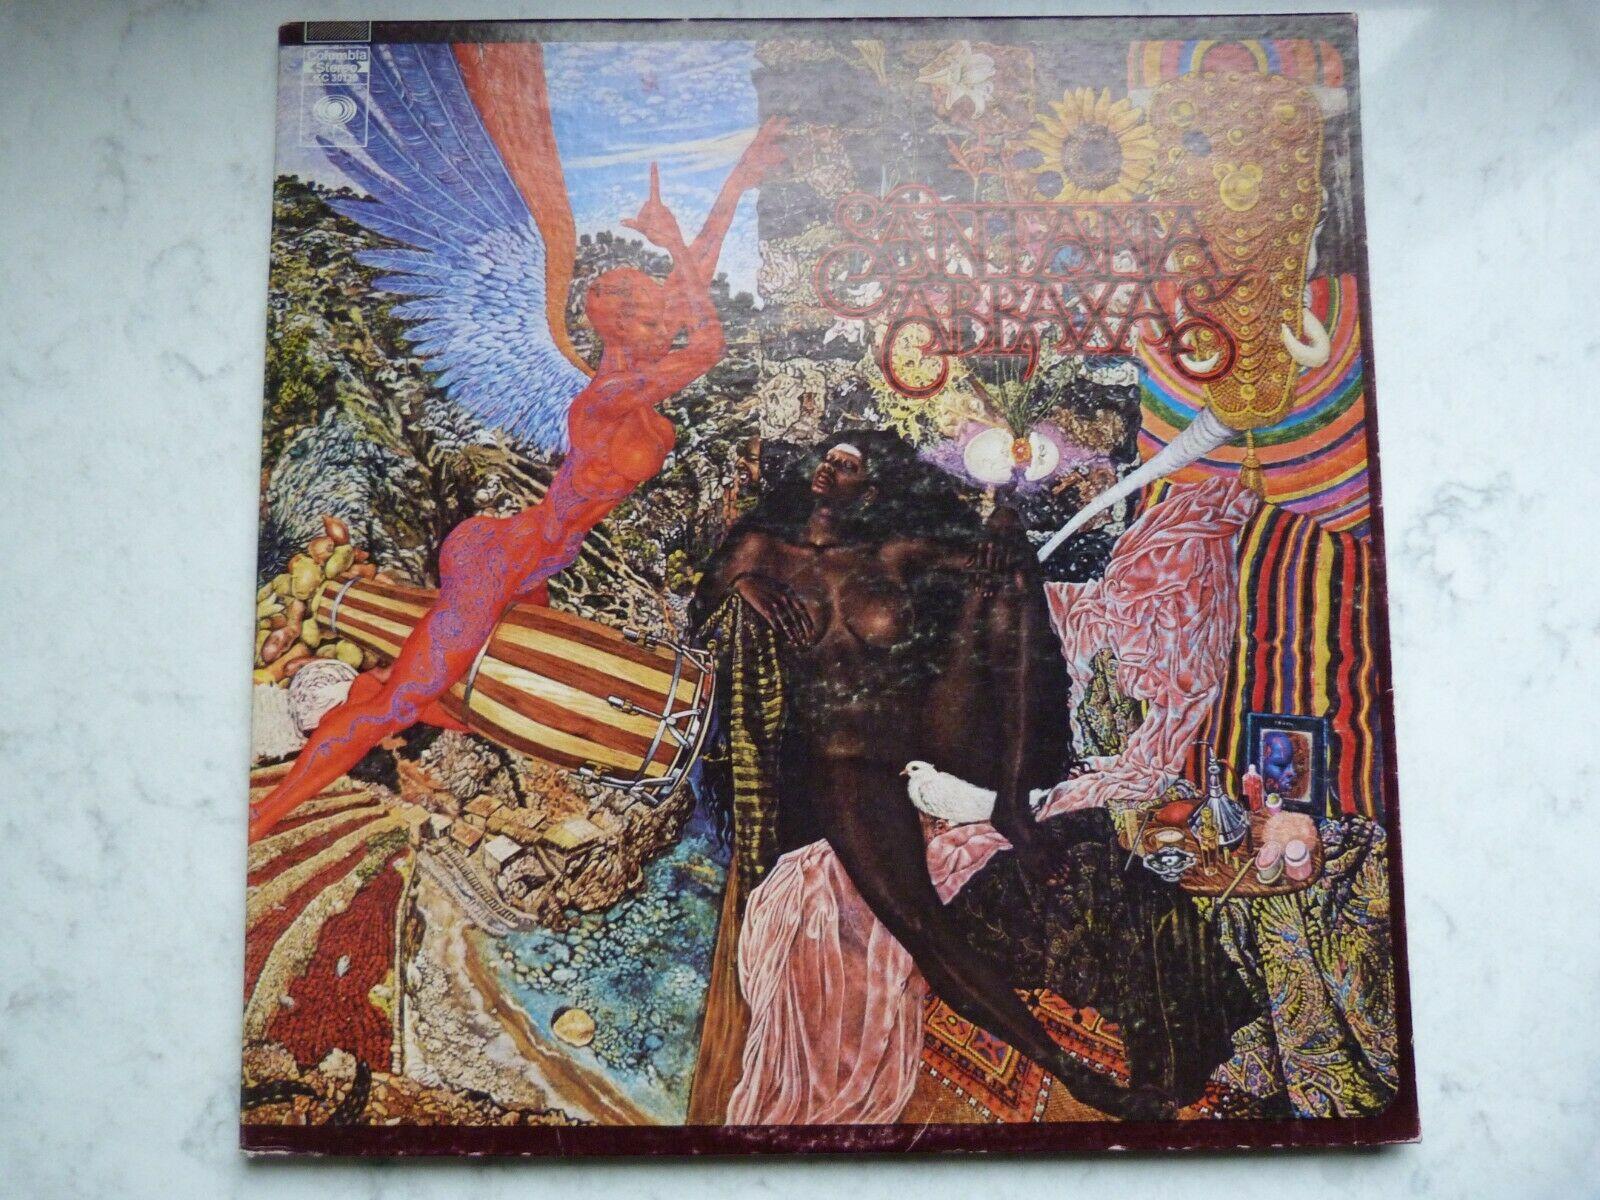 Santana Abraxas Columbia Stereo KC30130 Gatefold cover